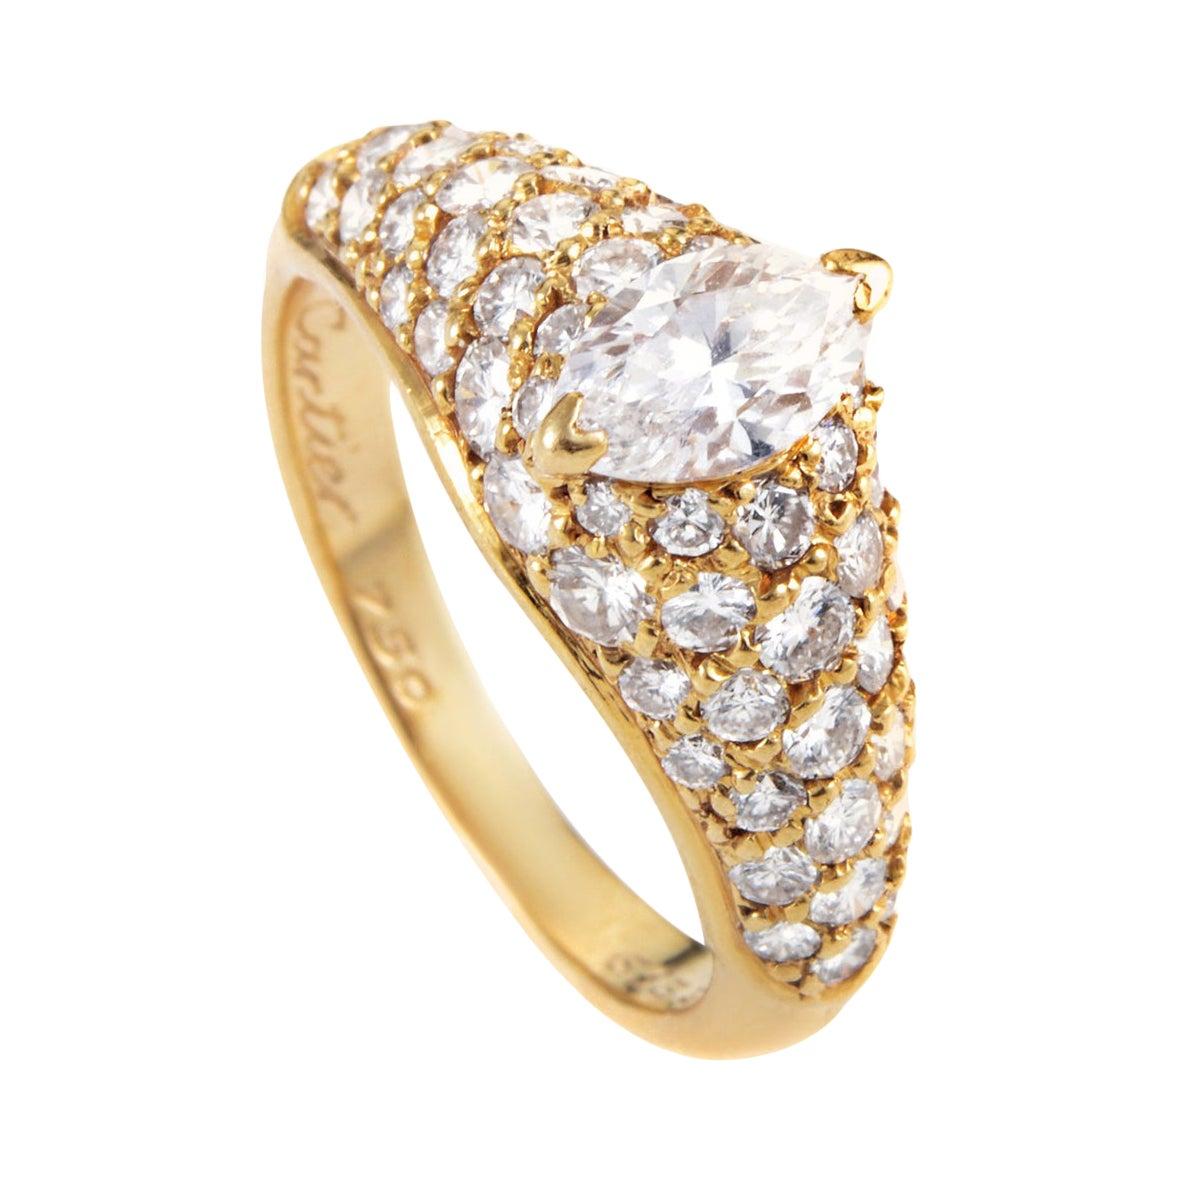 Cartier Marquise 1.25 Carat Diamond 18 Karat Yellow Gold Engagement Ring